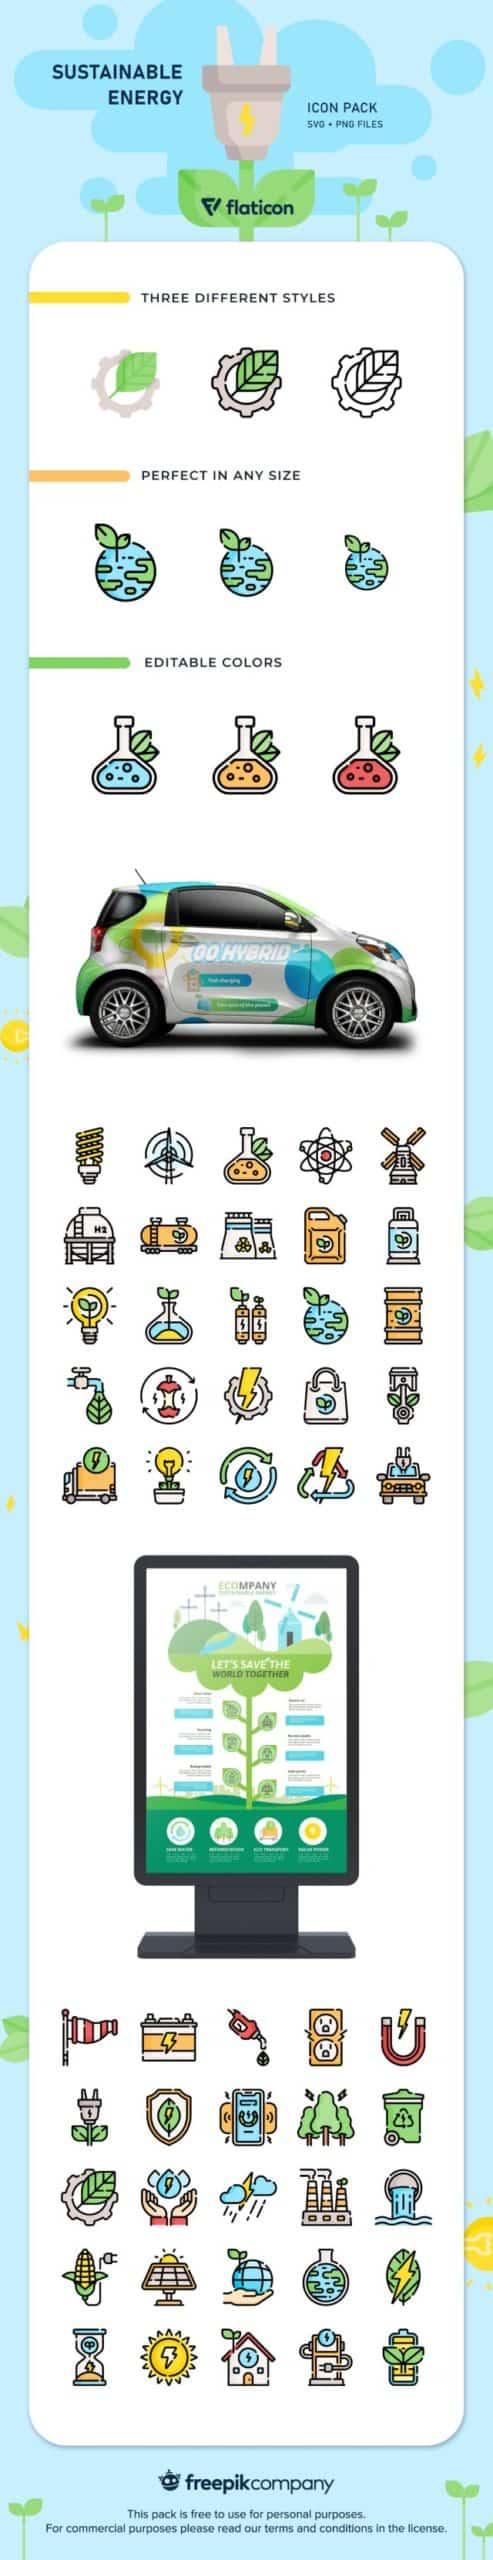 50 free sustainable energy icons